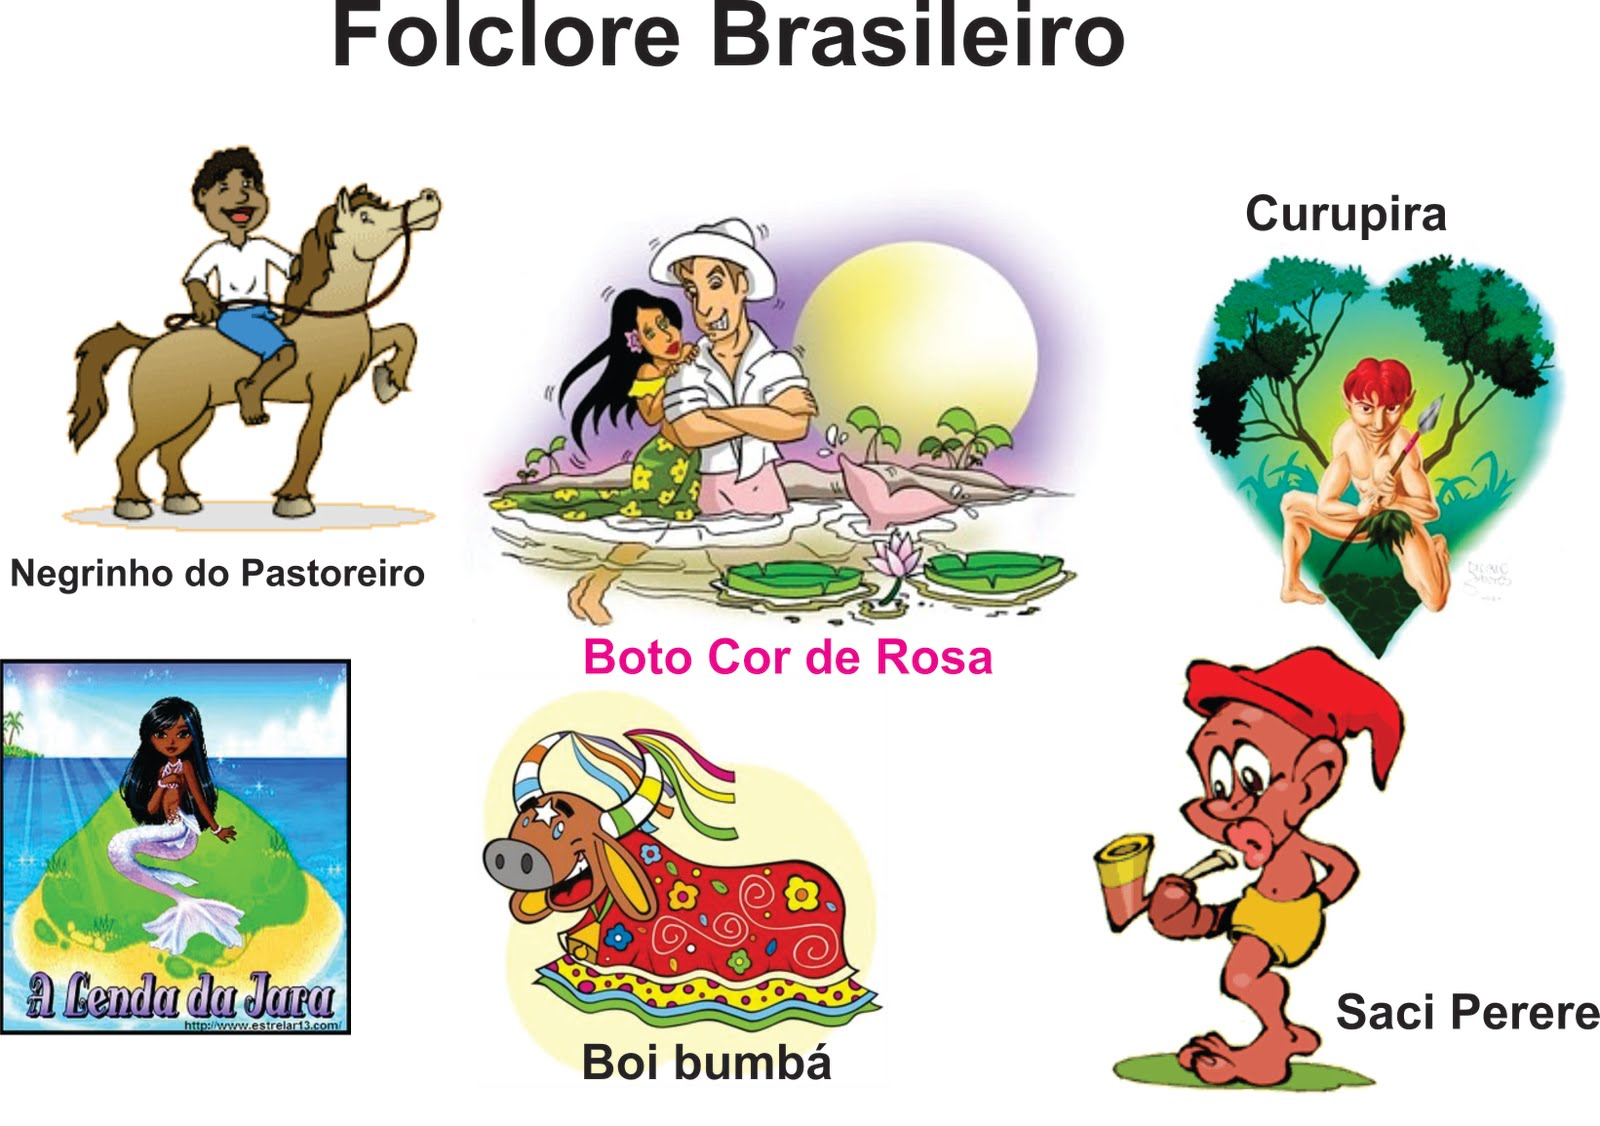 imagens de contos para imprimir coloridos